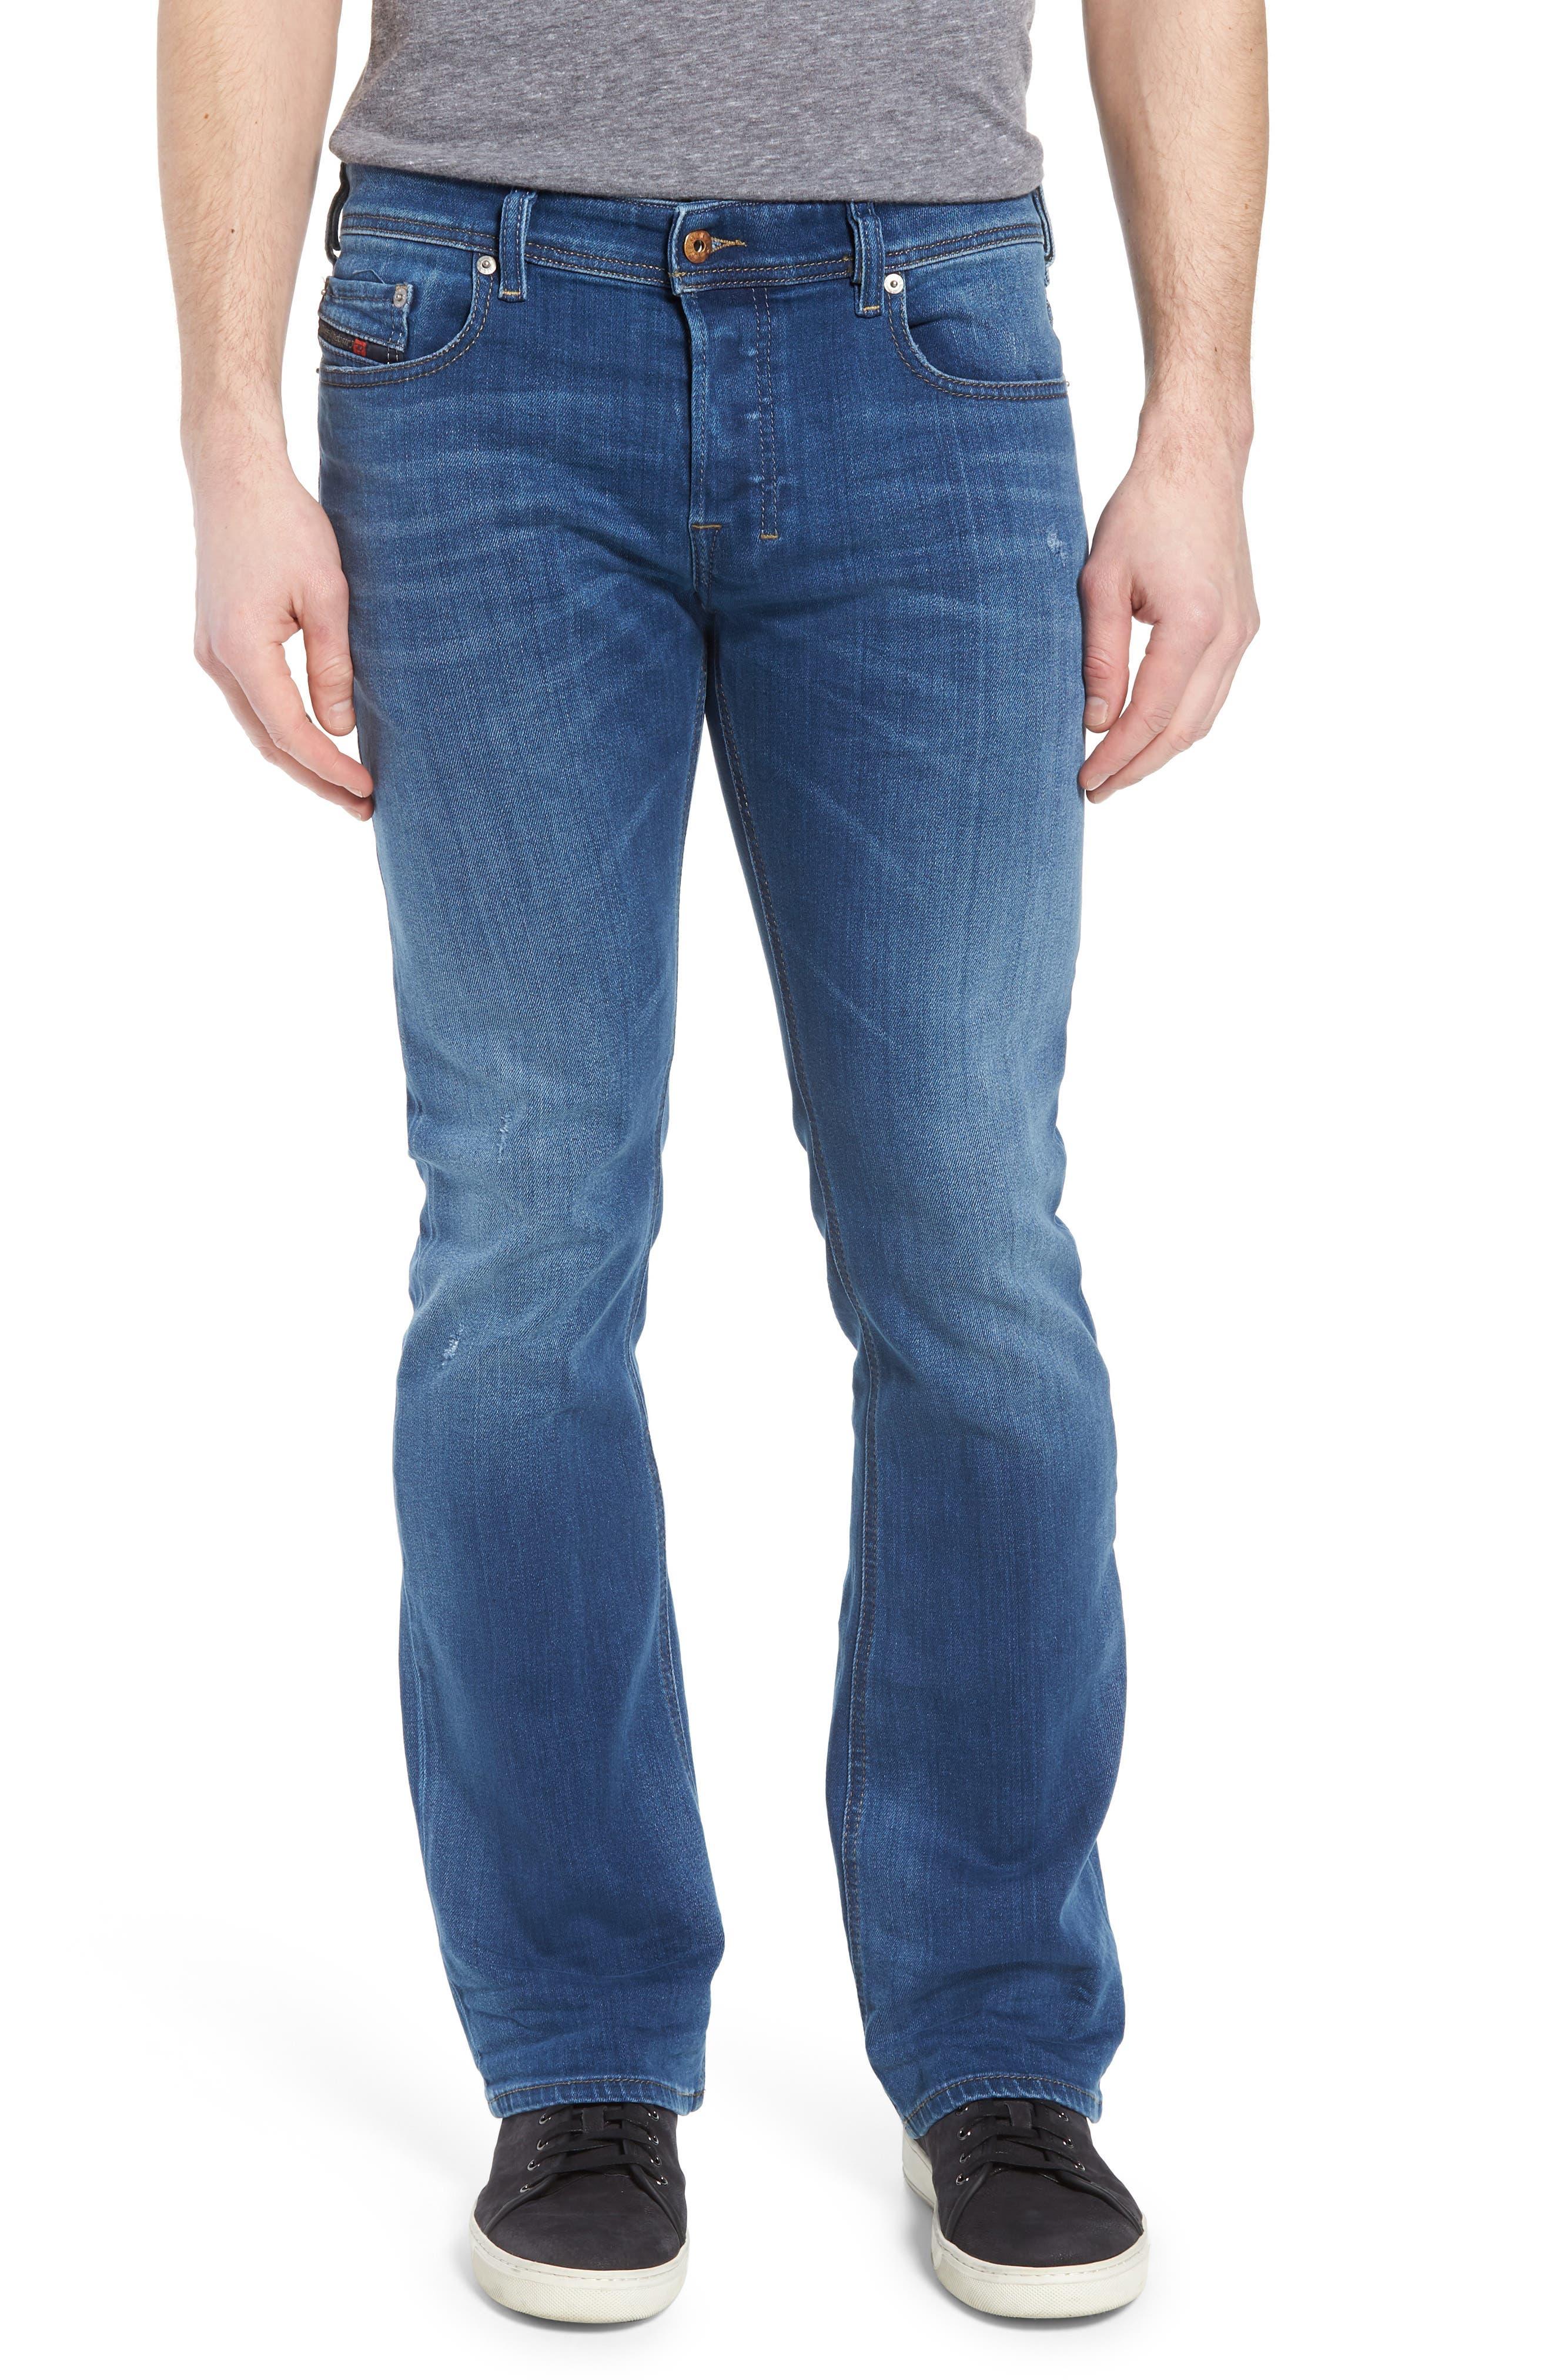 Zatiny Bootcut Jeans,                             Main thumbnail 1, color,                             Denim